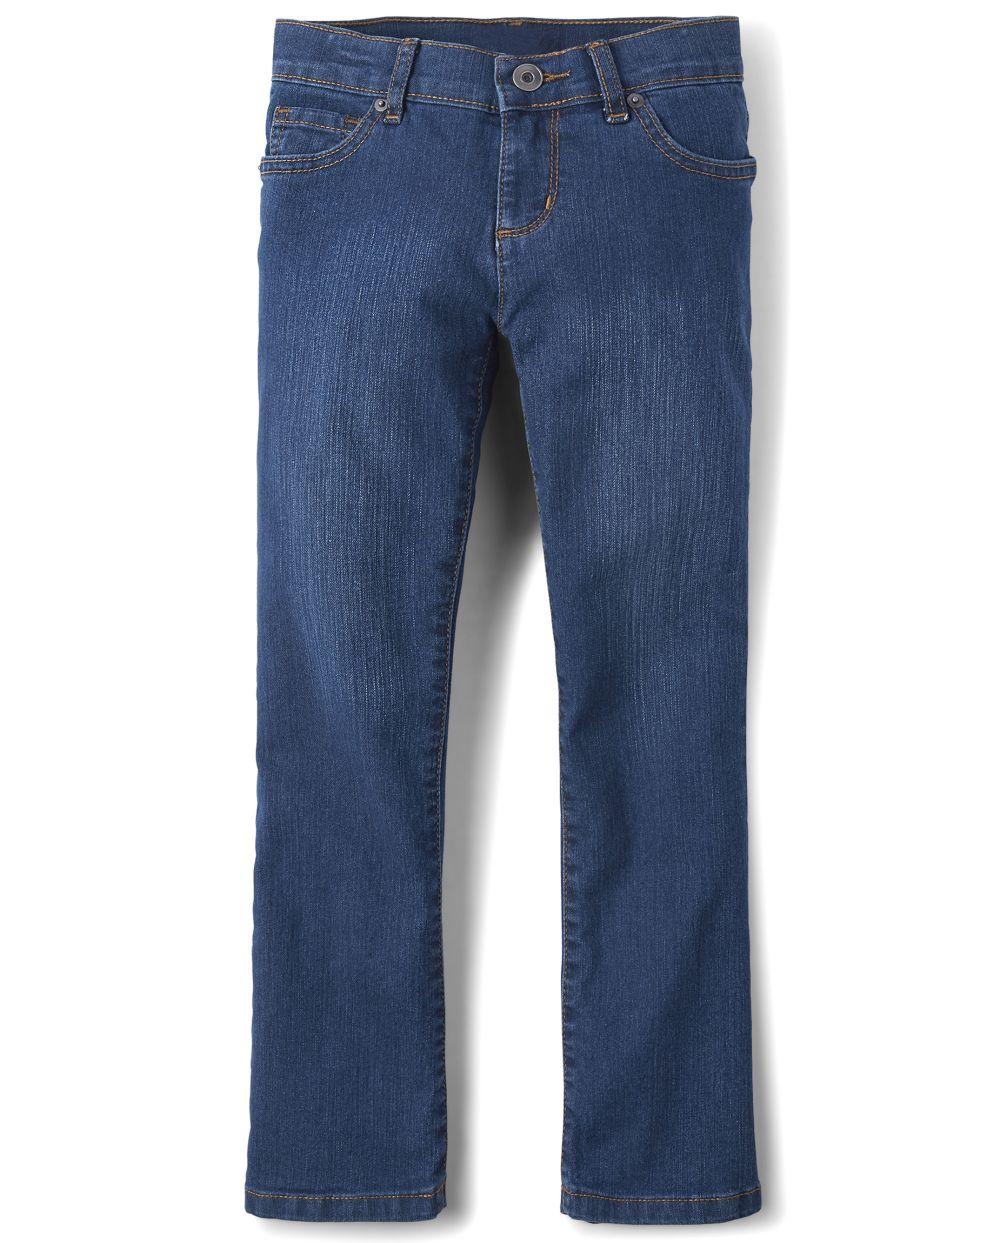 Girls Basic Bootcut Jeans